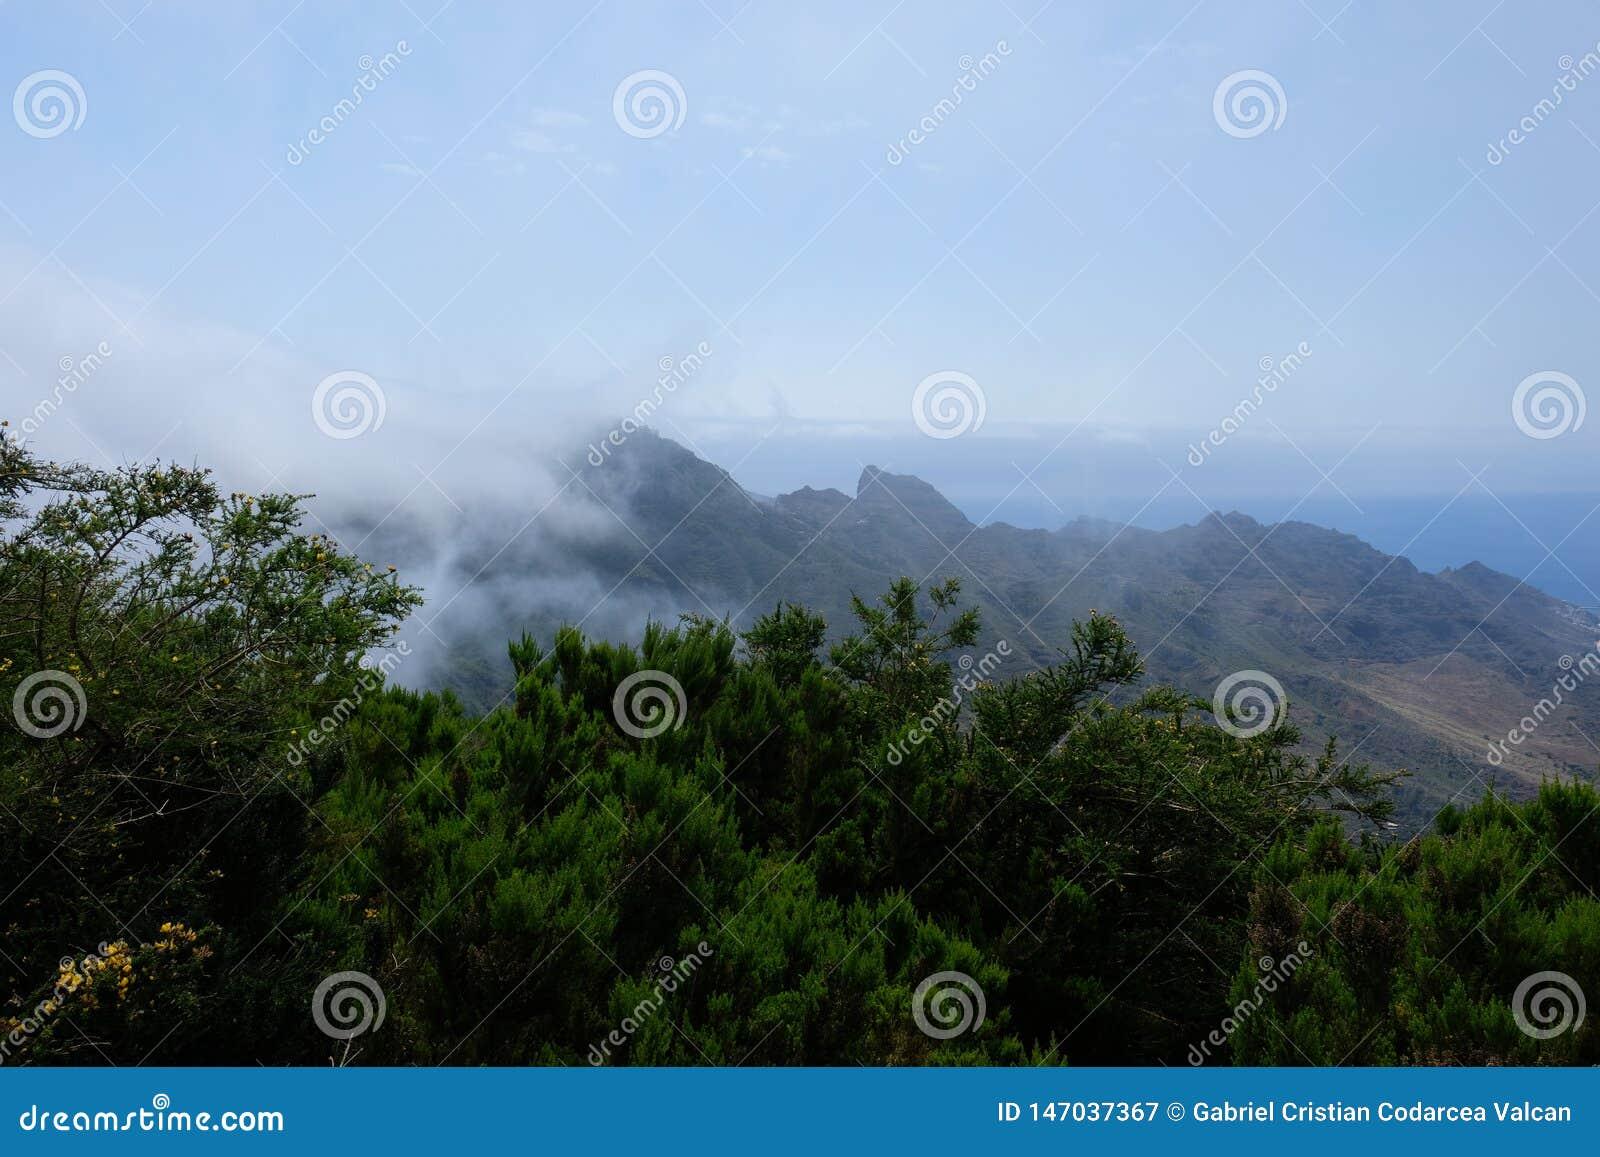 Chmurni widoki górscy z morzem na tle